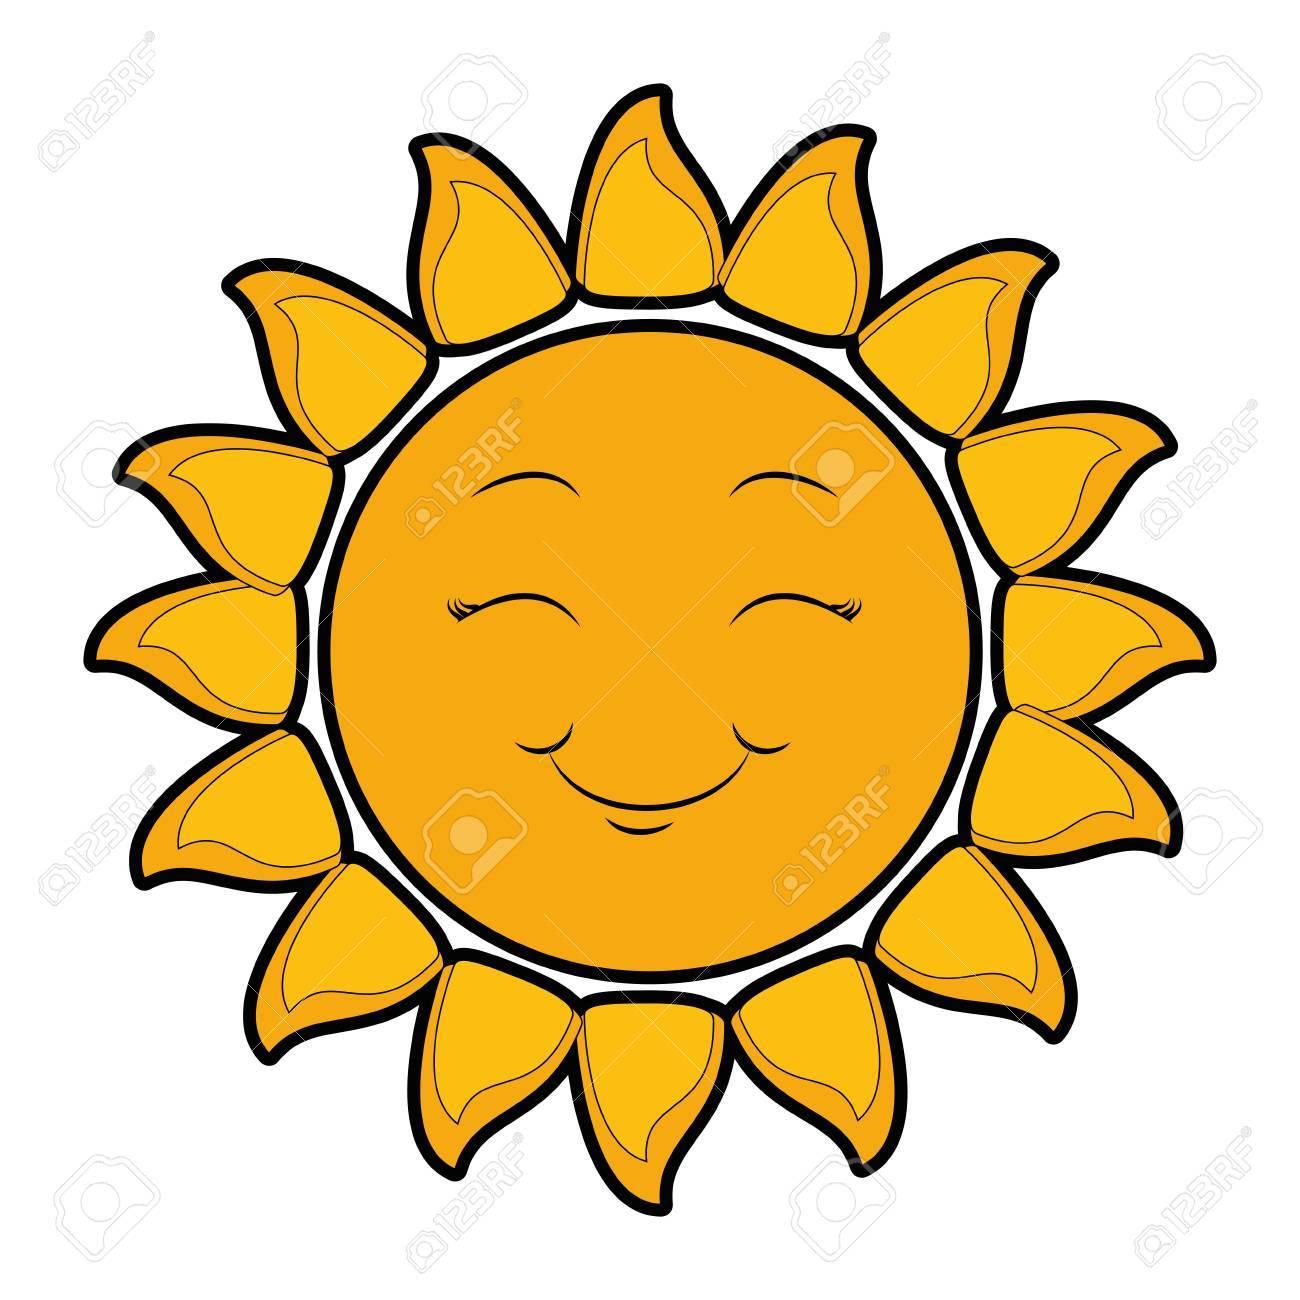 isolated yellow sun face icon vector illustration graphic design rh 123rf com Sun Face Drawings Cartoon Sun with Face